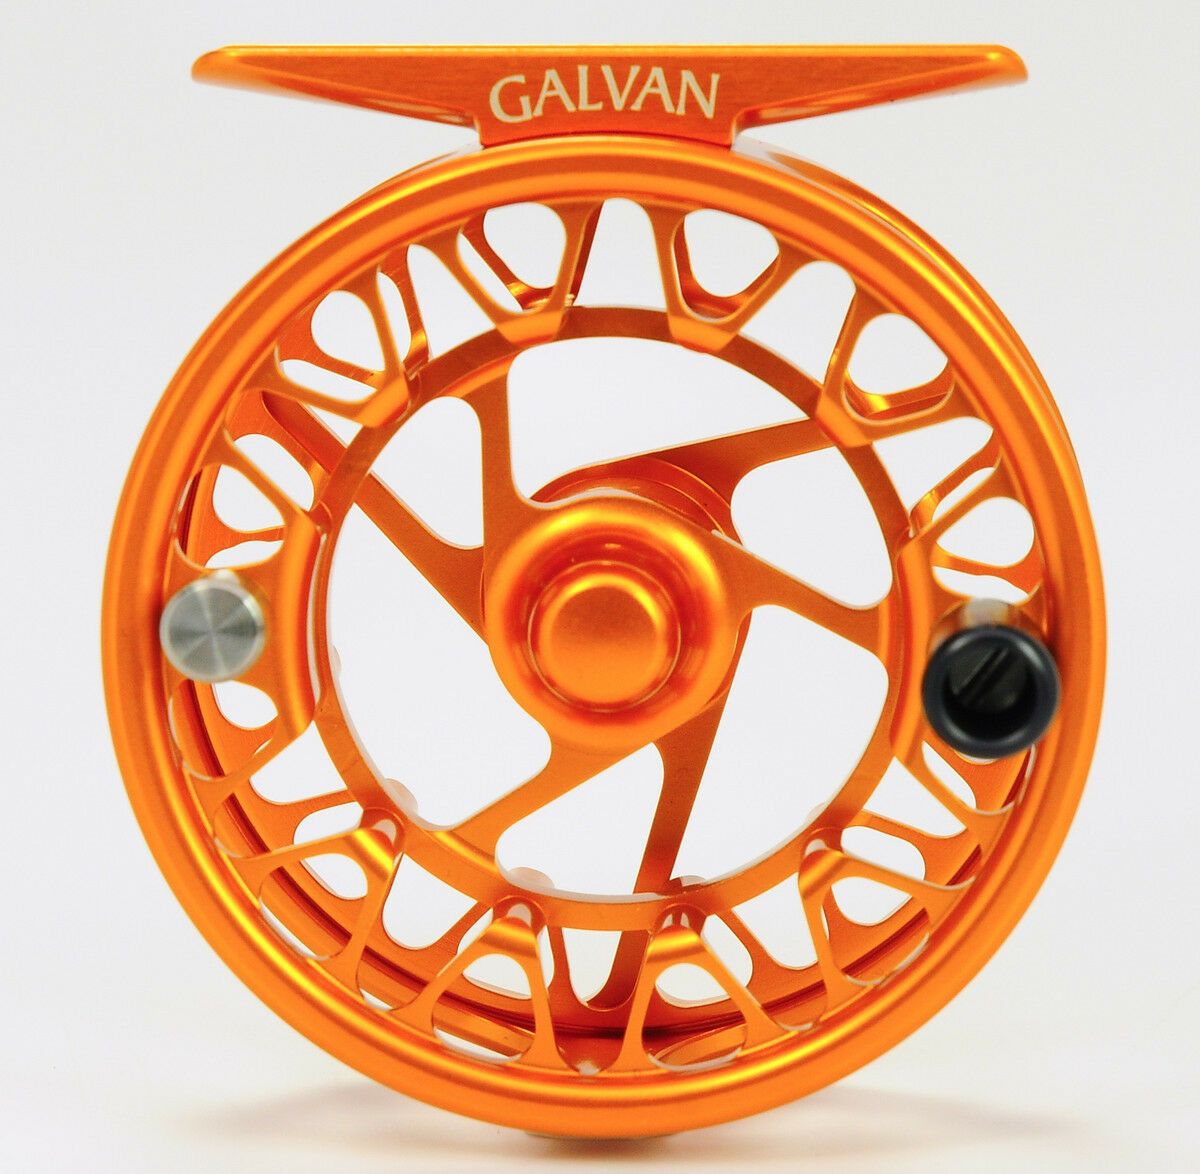 Galvan Brookie B 3 4 Ultra Ligero Grande Arbor Fly Reel Raro Naranja Quemado